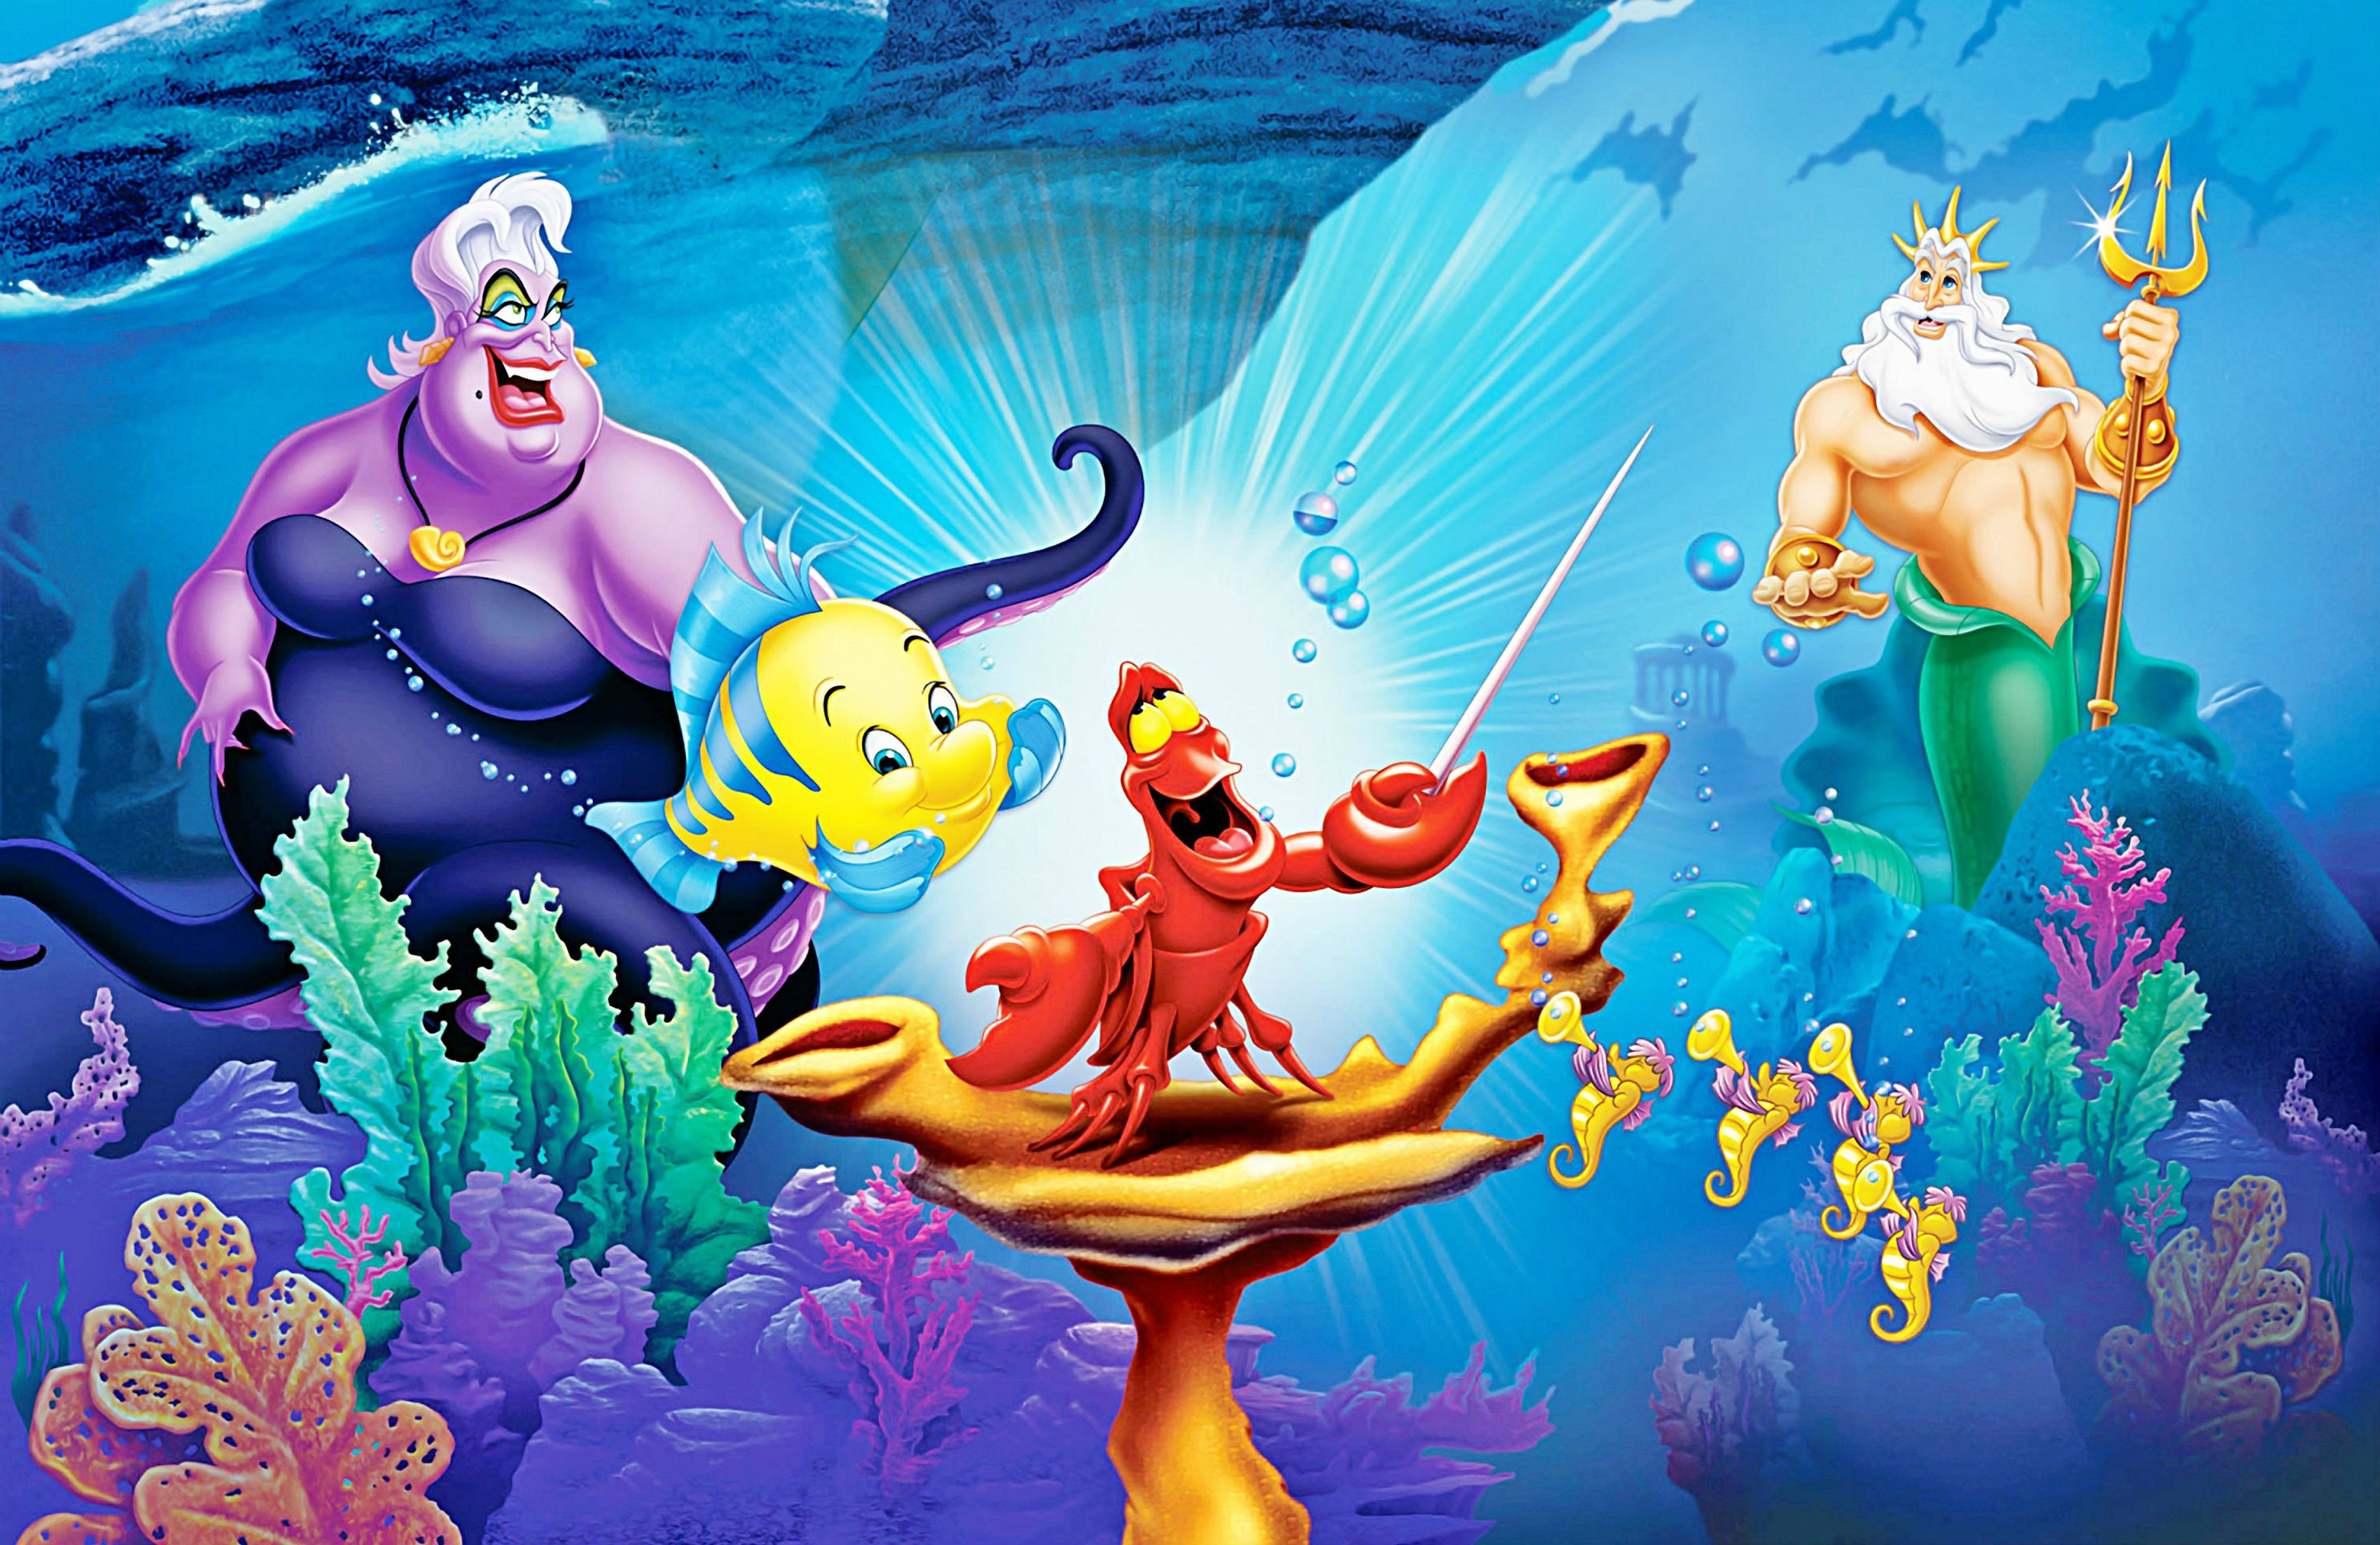 Little Mermaid Disney Fantasy Animation Cartoon Adventure Family 1litt...